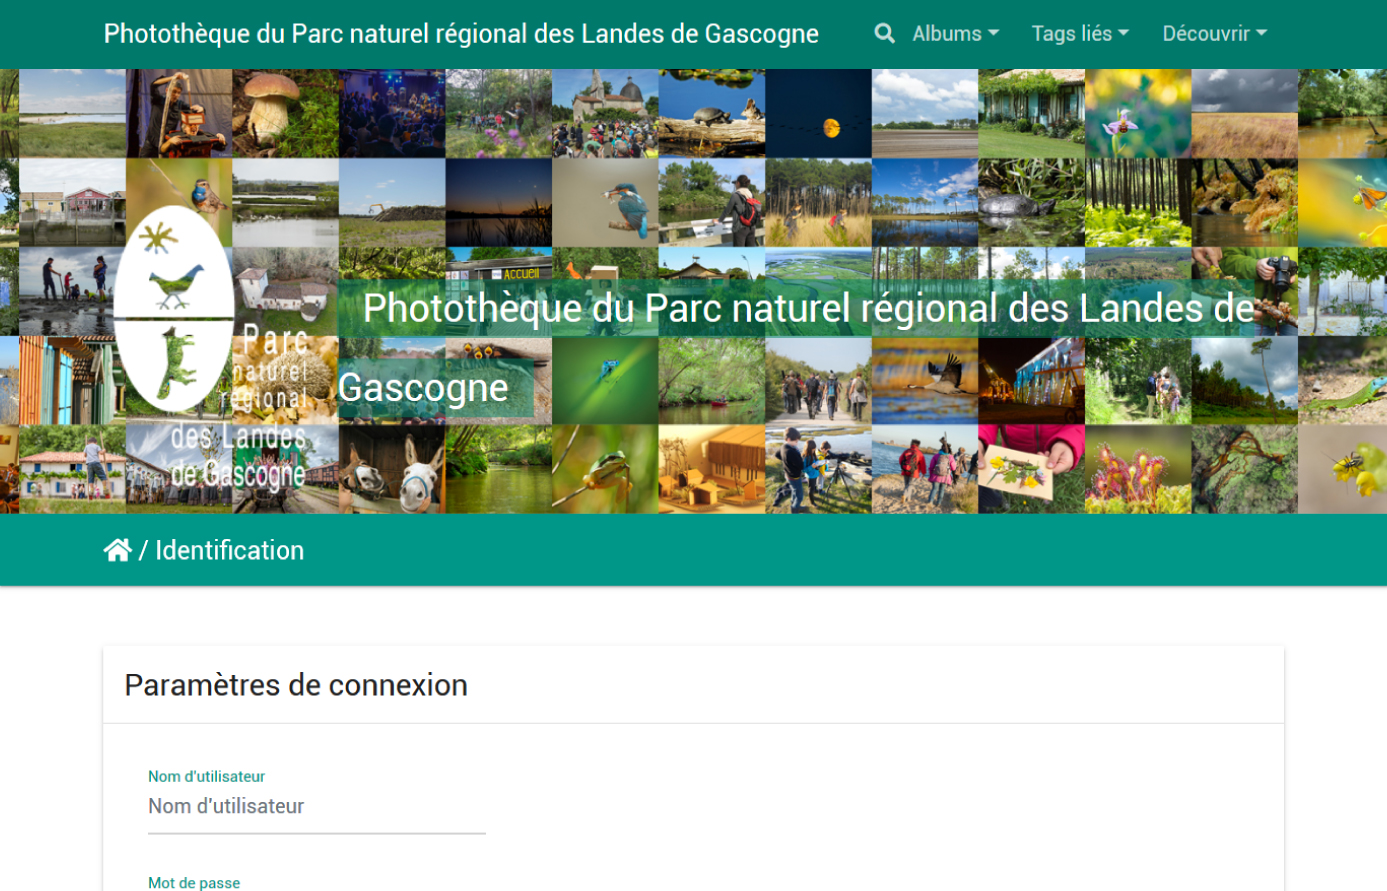 The Regional Natural Park Landes de Gascogne